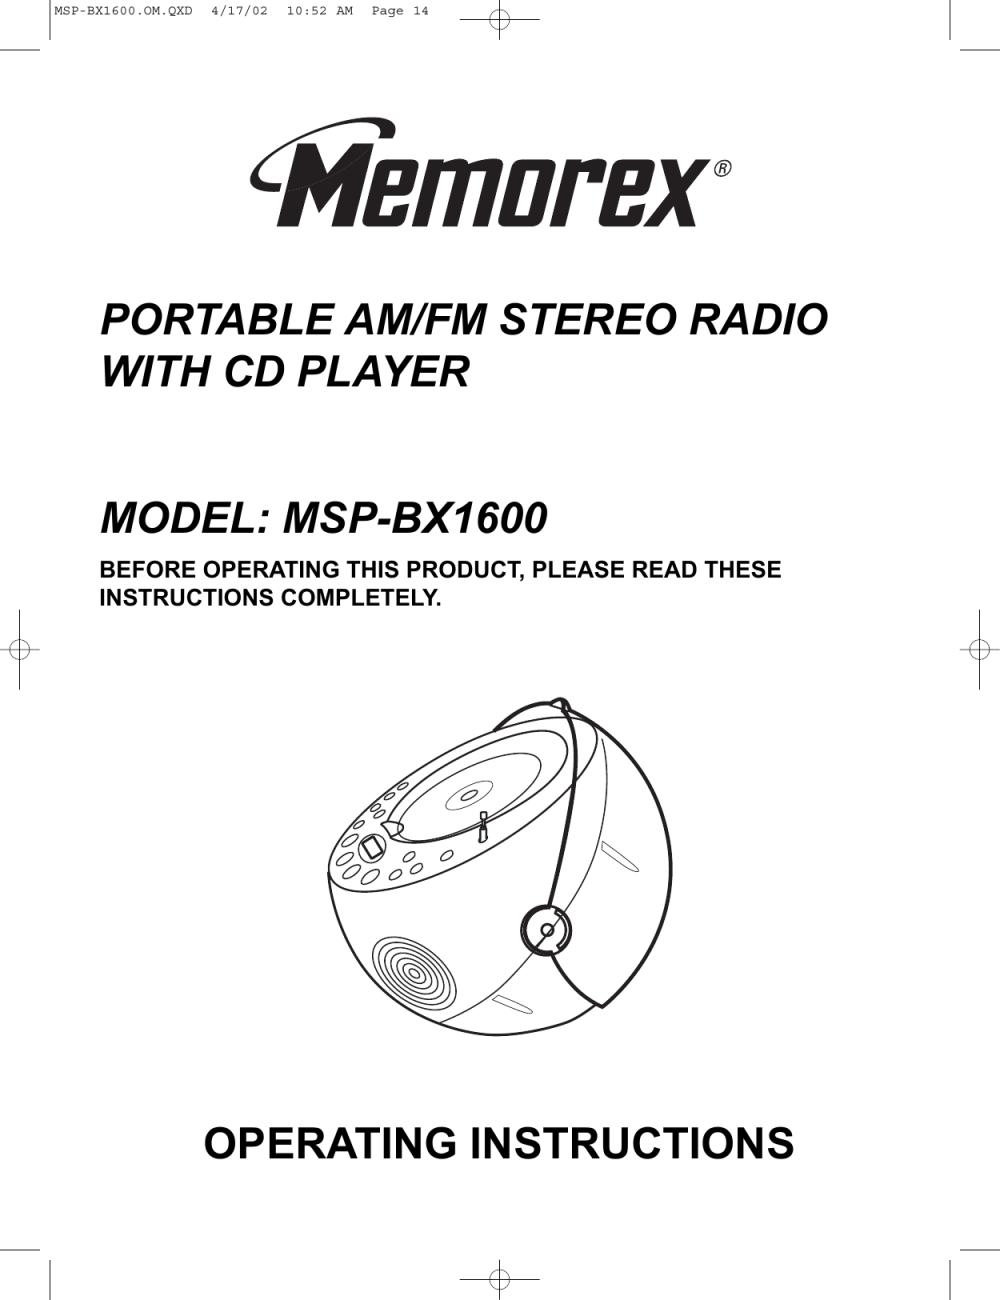 medium resolution of memorex 4701 wiring diagram wiring diagram yermemorex wiring diagram wiring diagrams operations memorex 4701 wiring diagram